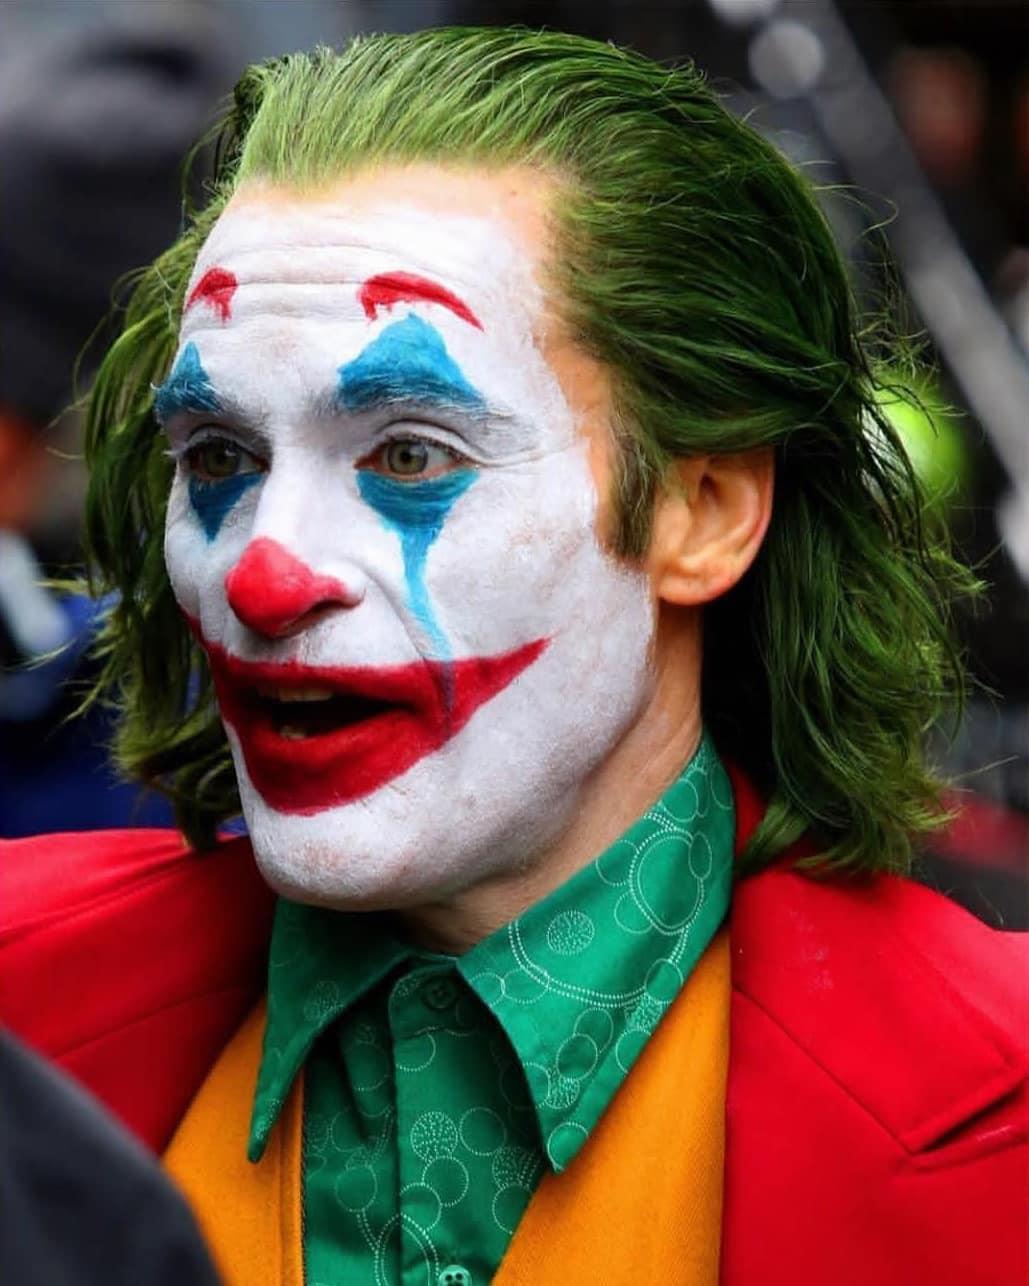 Joker 2019 Wallpapers High Quality Download 1029x1286